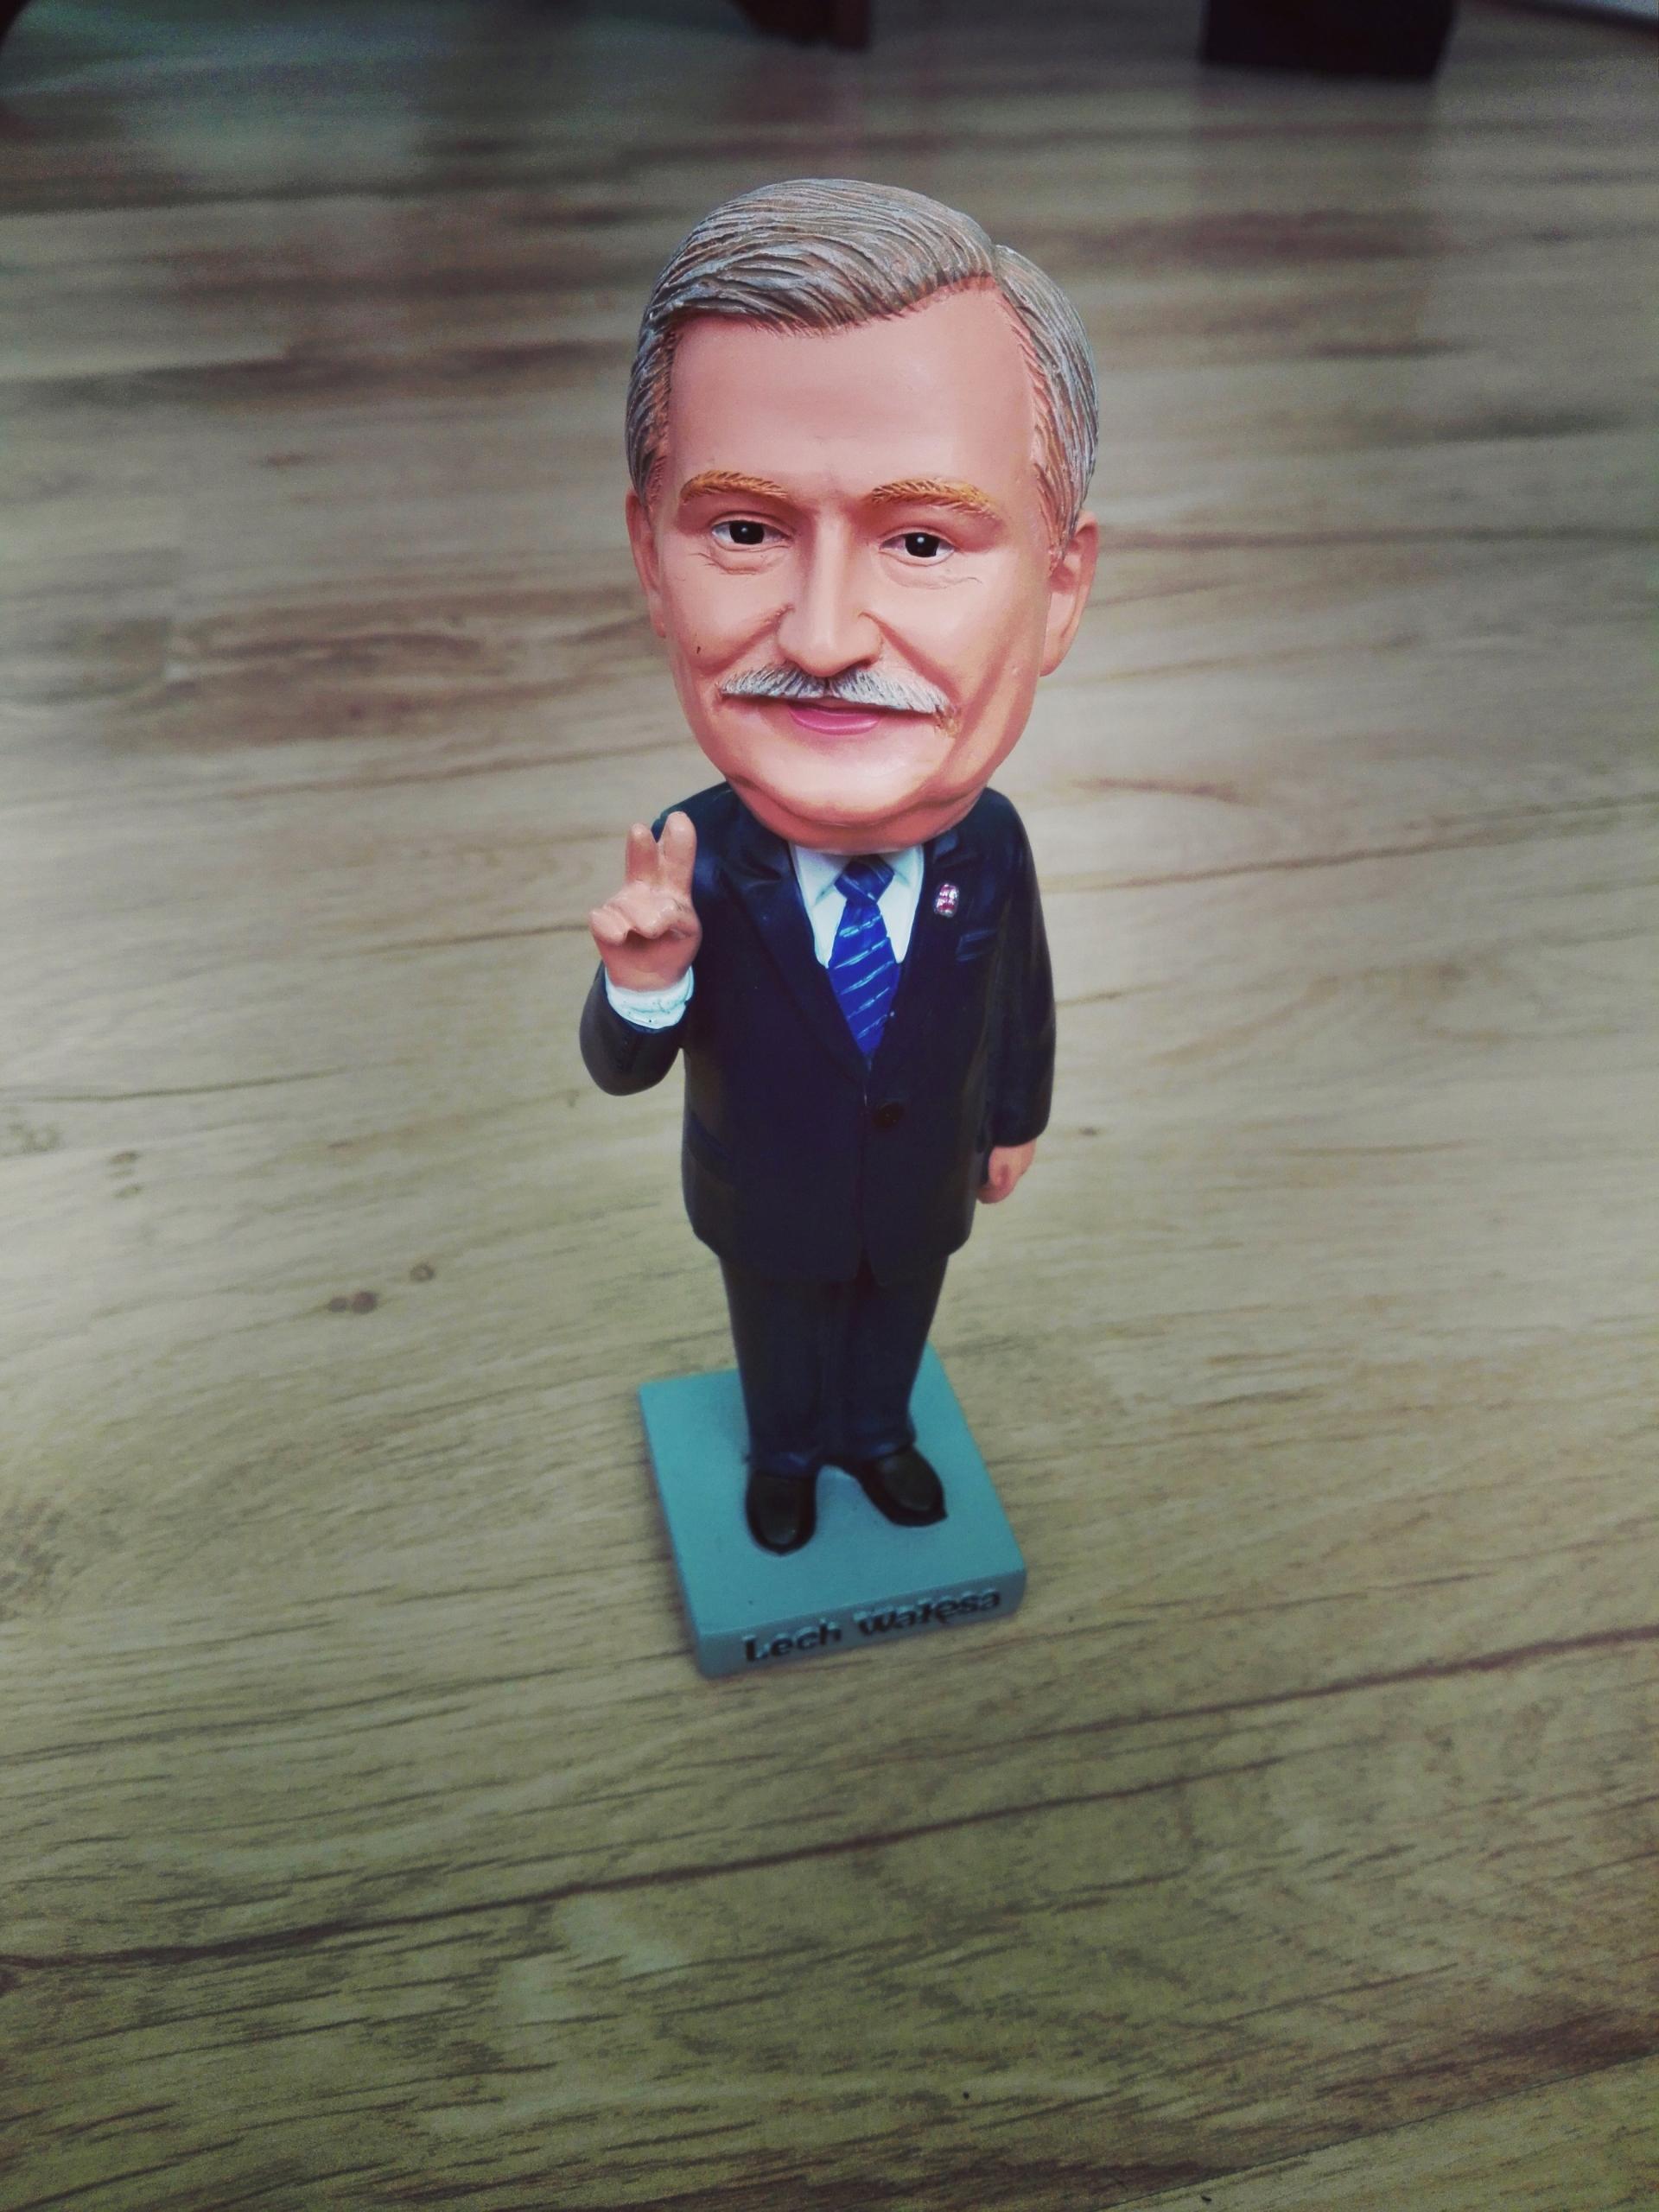 Статуэтка Президента, фигурка , подарок Лех Валенса